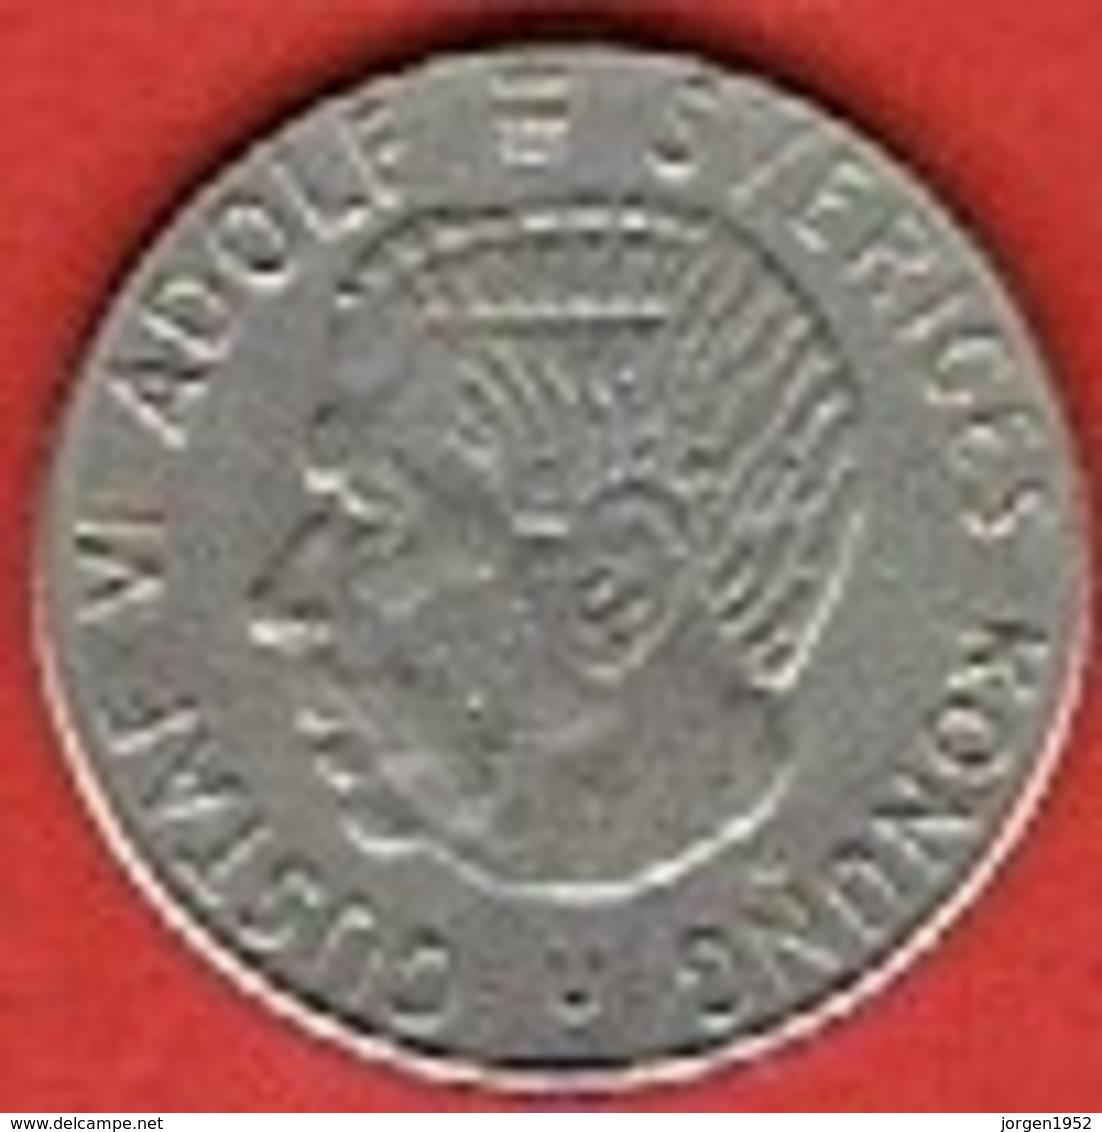 SWEDEN #  1 KRONE FROM 1968 - Suède